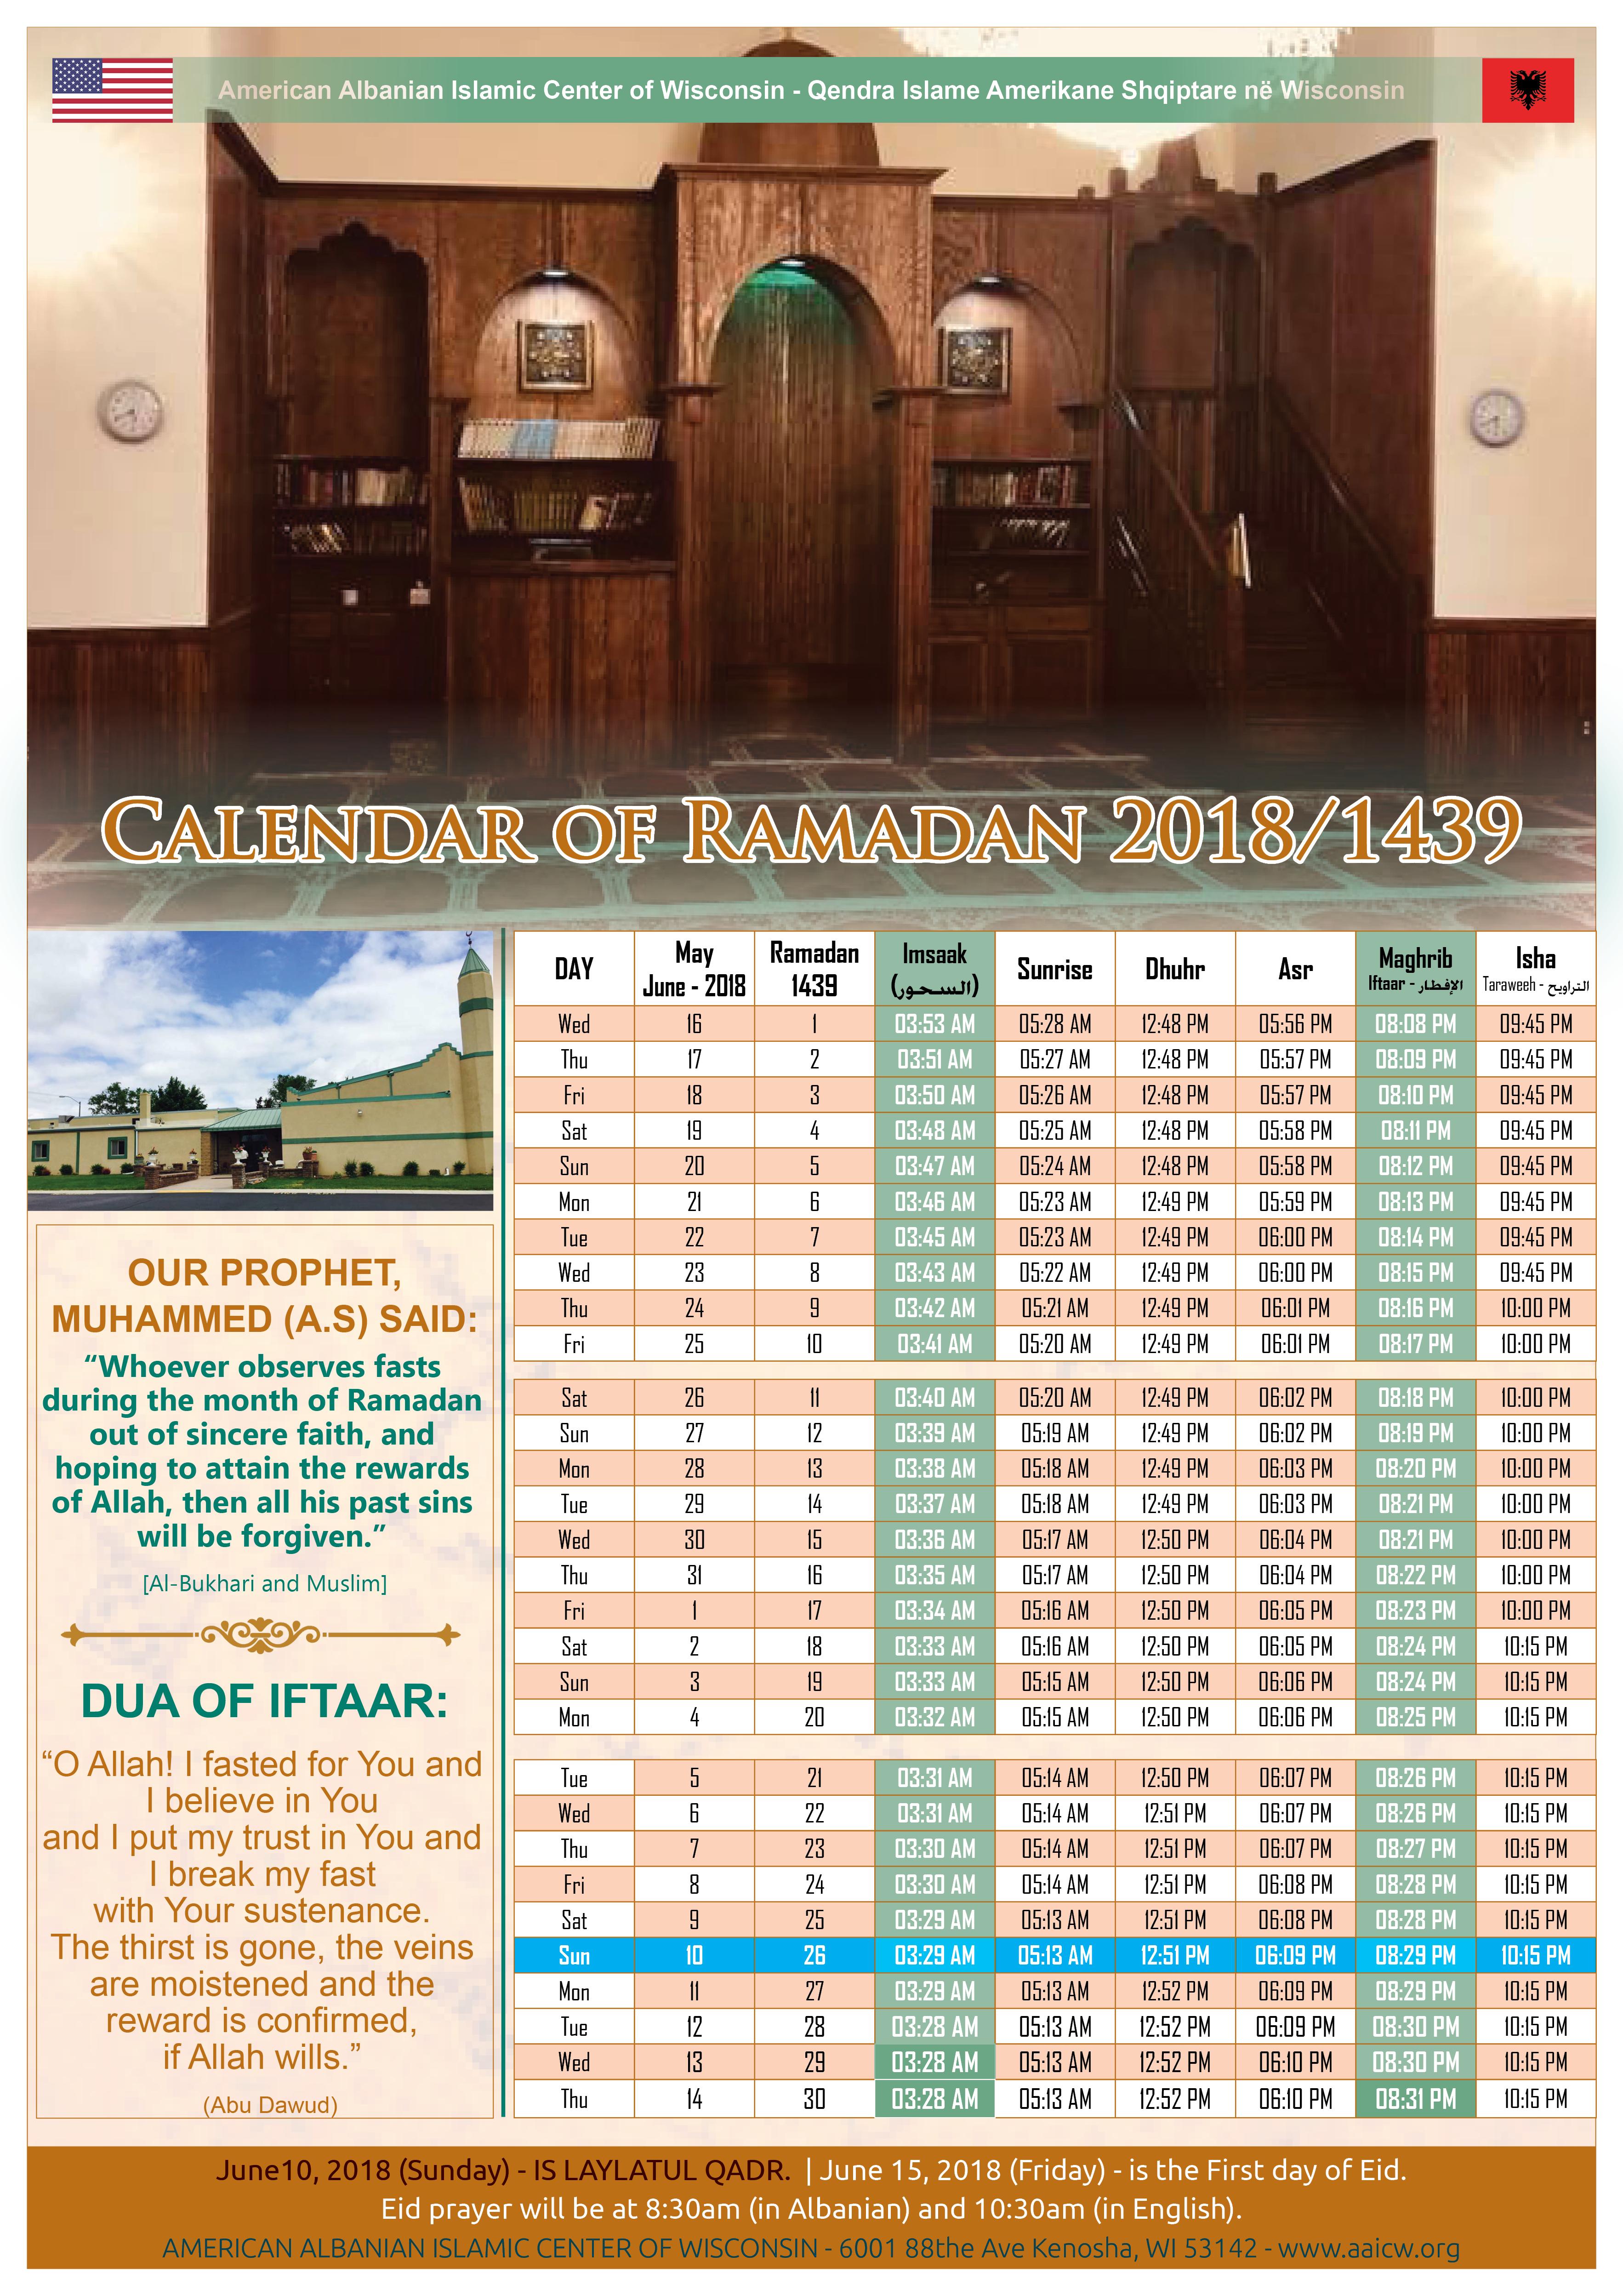 AAICW- Calendar of Ramadan 2018/1439